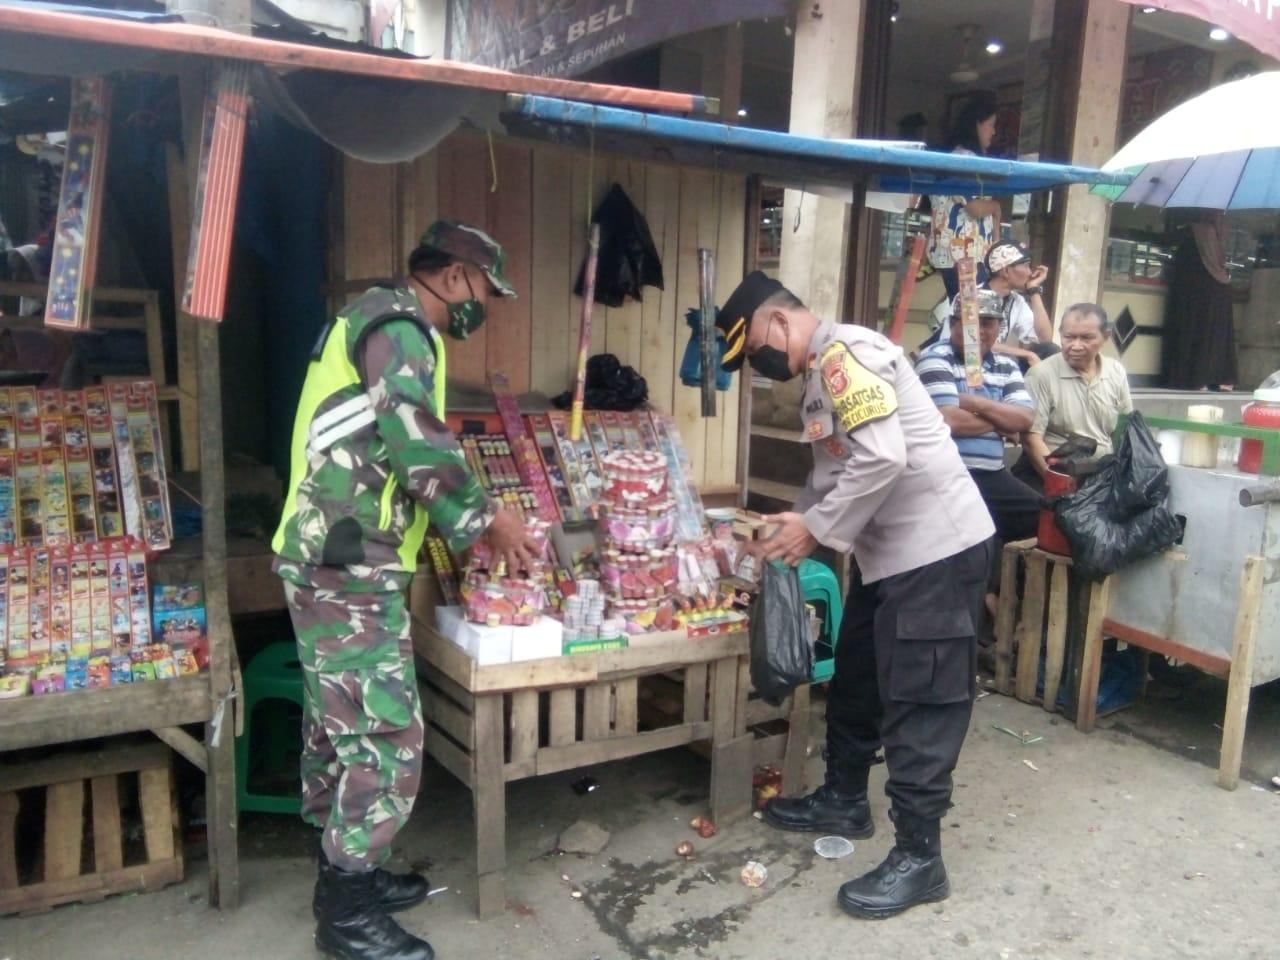 Jelang Malam Tahun Baru, Satpol PP Kecamatan Cicurug Razia Petasan